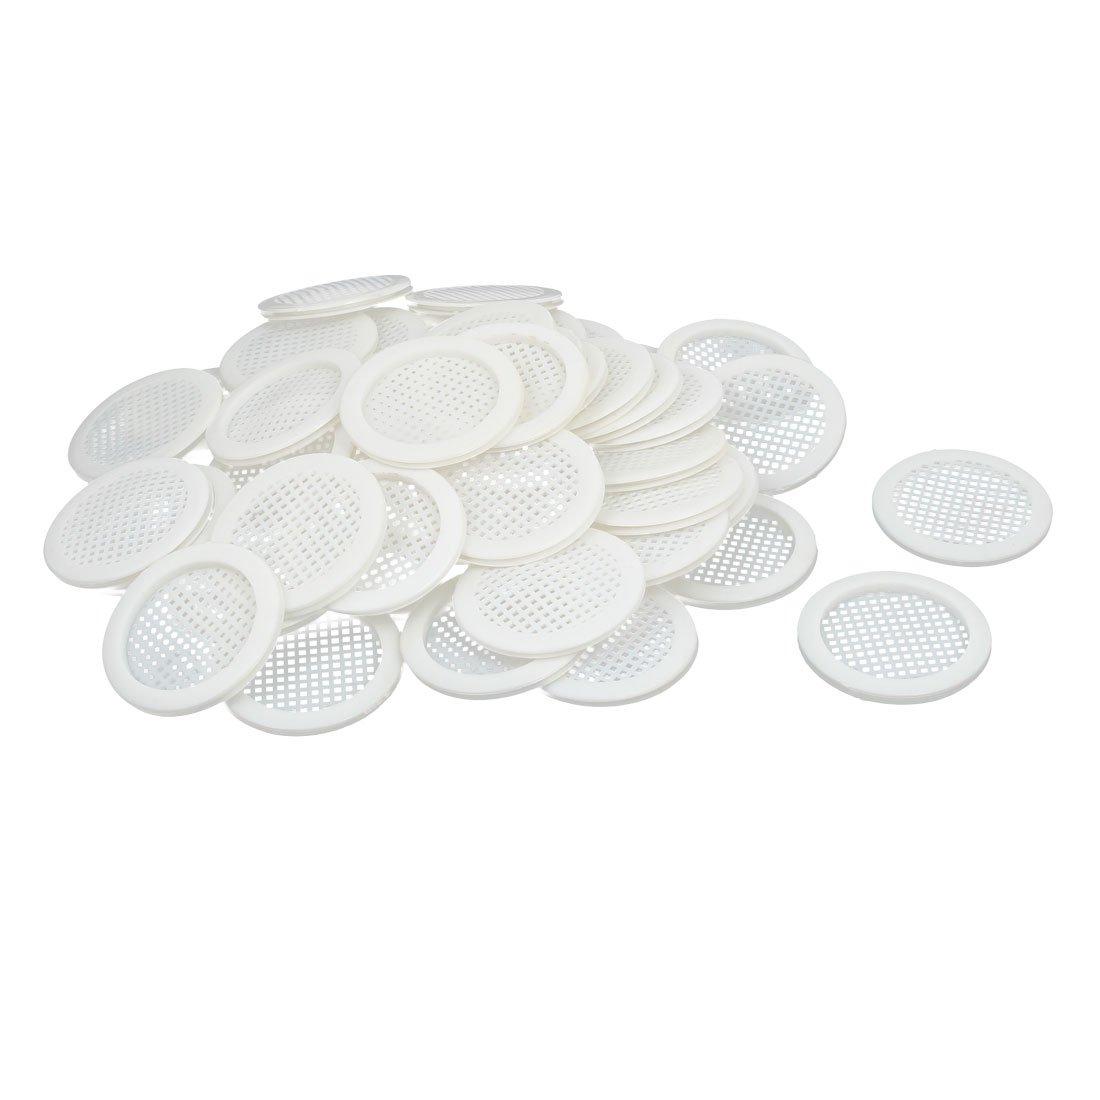 uxcell Shoes Cabinet 67mm Dia Plastic Square Mesh Hole Air Vent Louver Cover White 50pcs